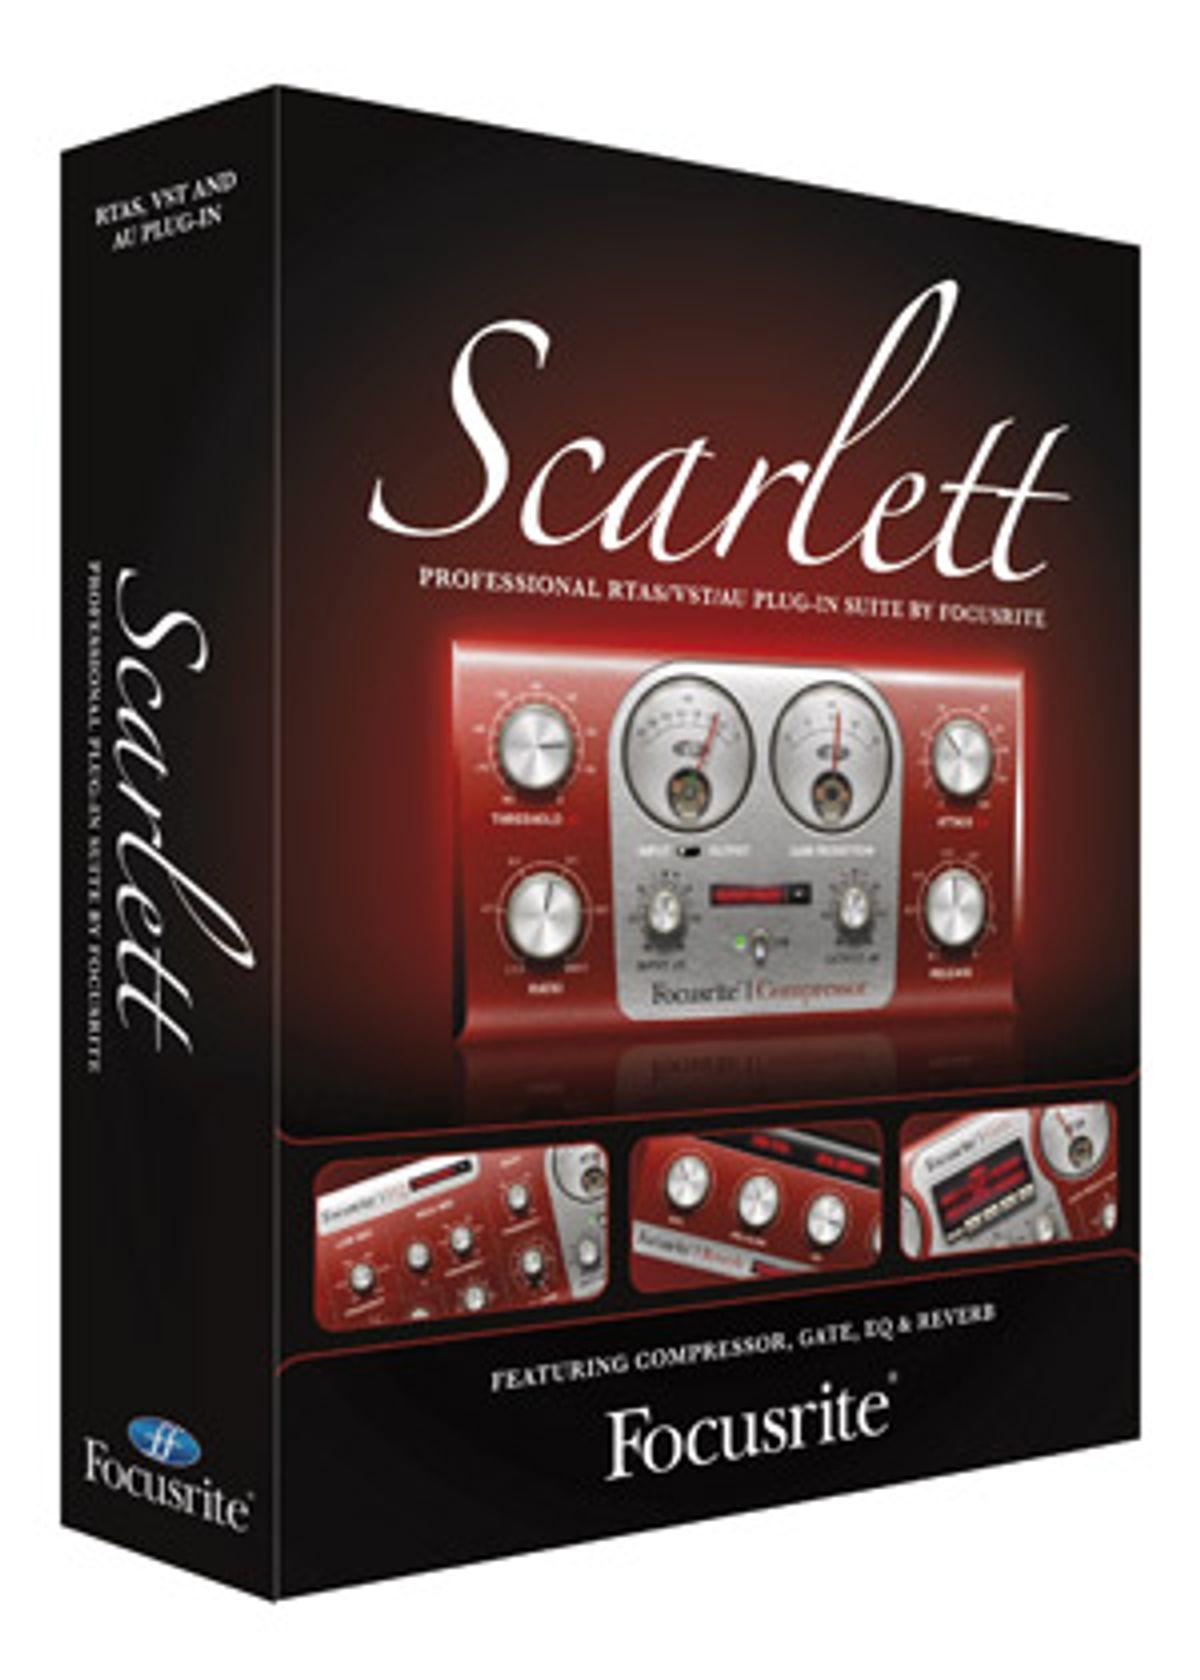 Focusrite Introduces the Scarlett Plug-in Suite